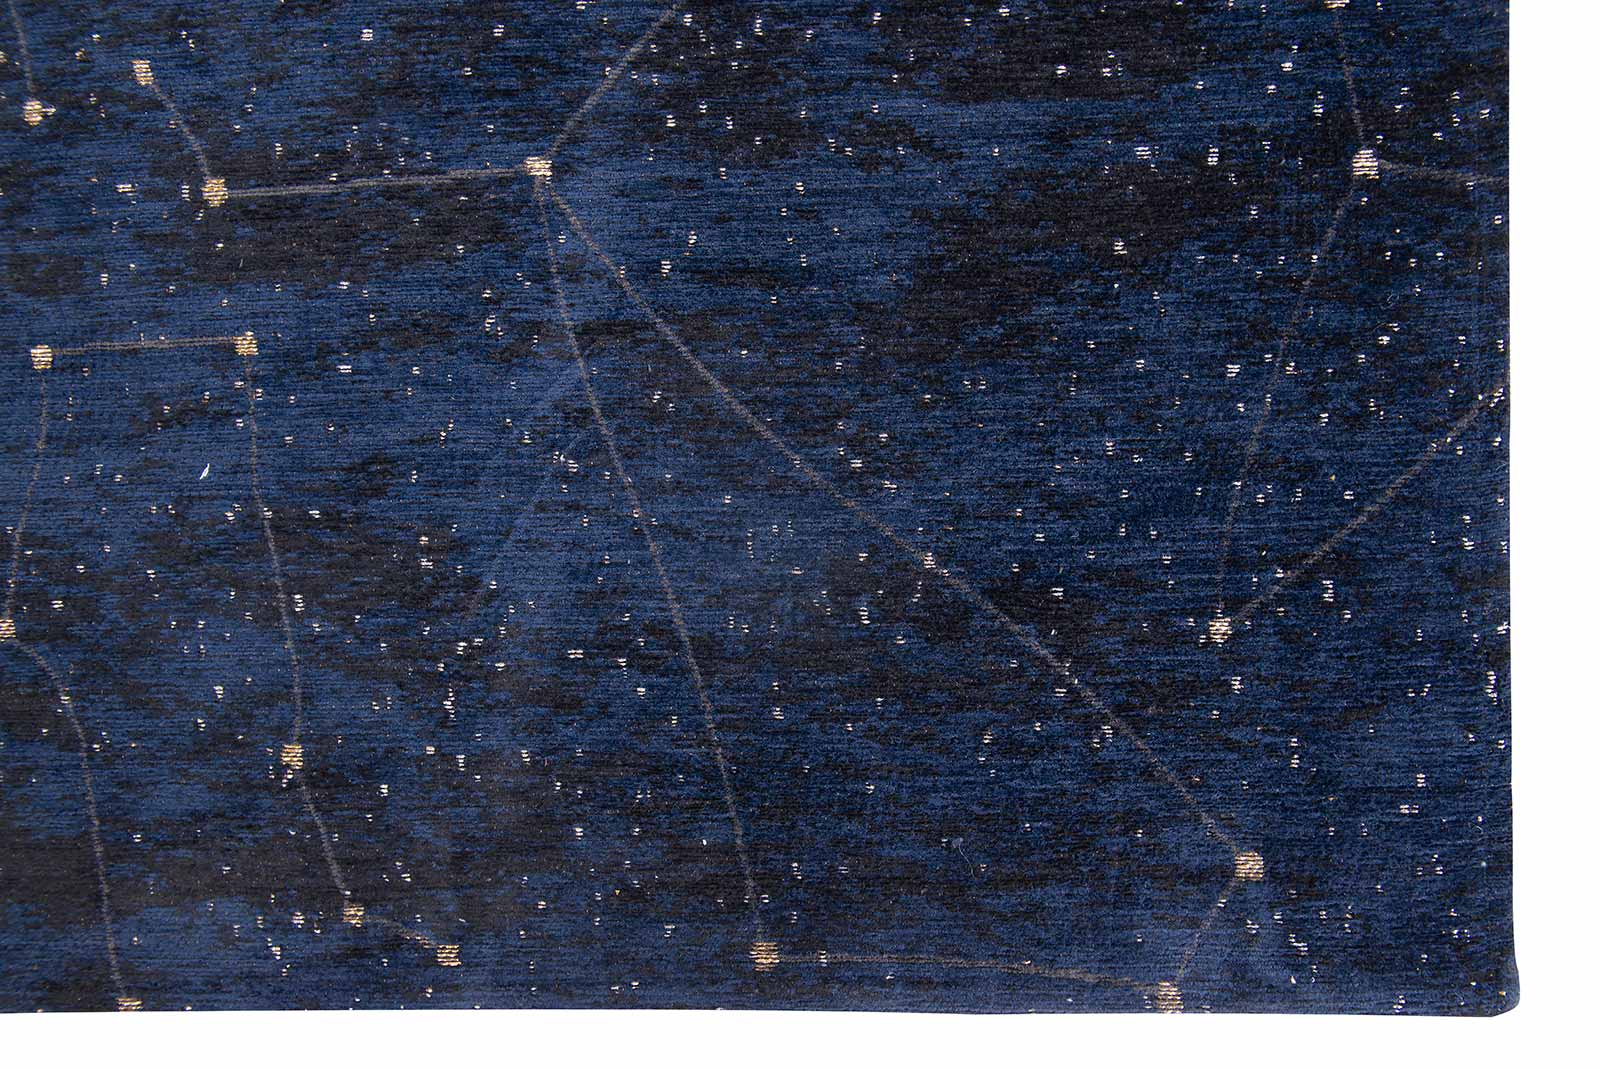 Louis De Poortere tapis Fischbacher 9060 Celestial Midnight Blue corner